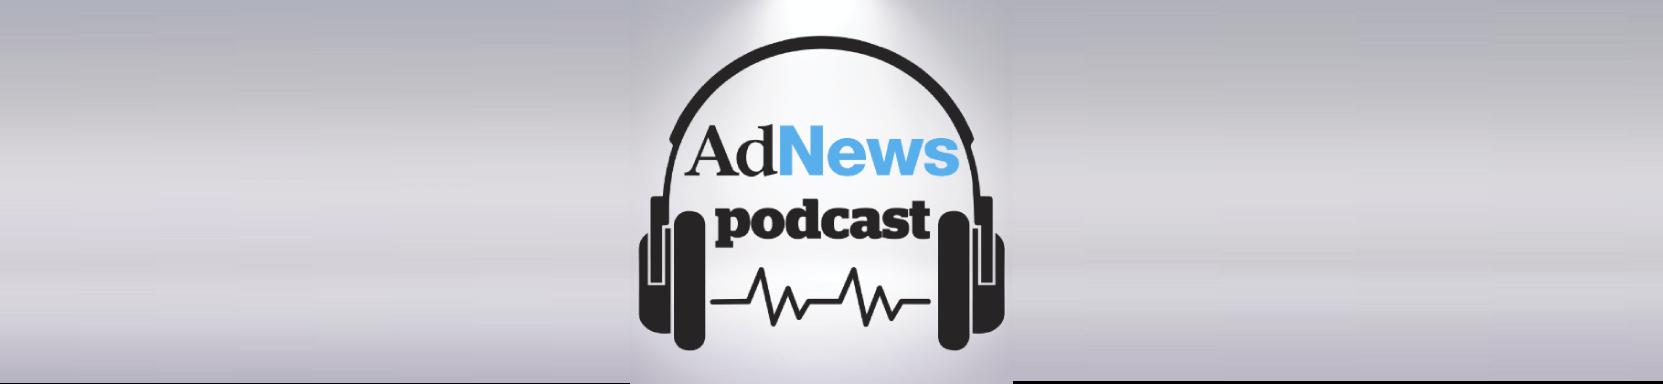 AdNews Advertising Marketing Podcast